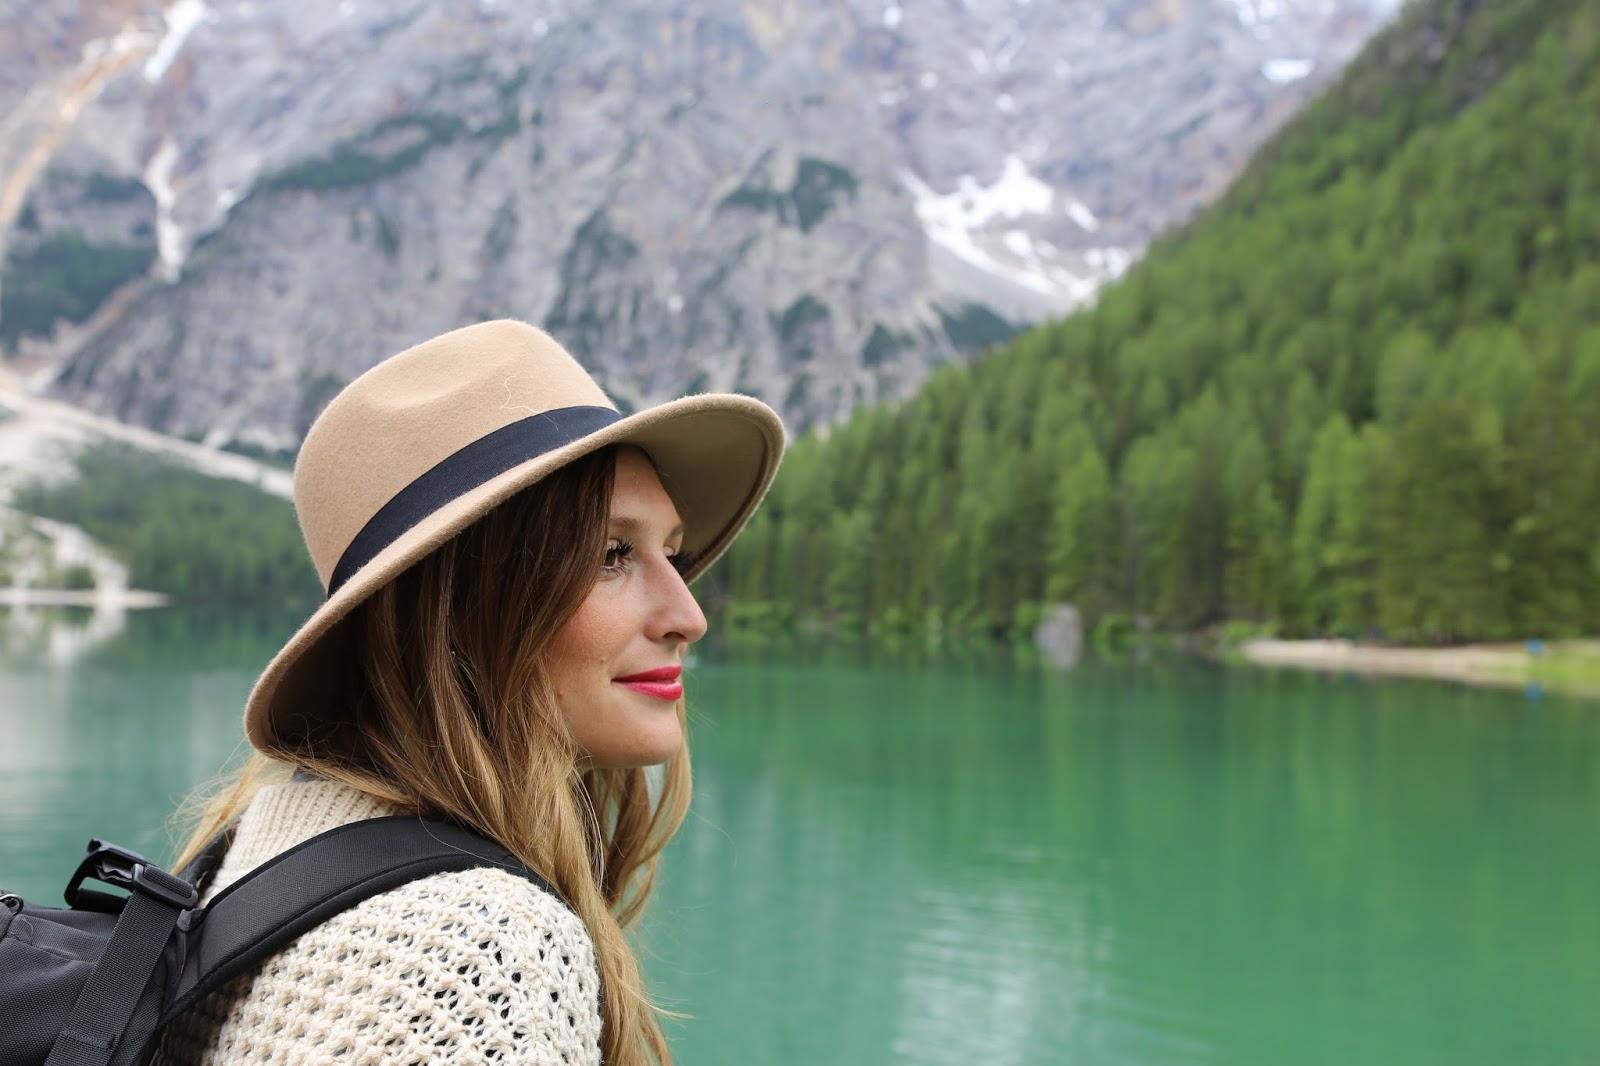 Münchner Blogger - Frankfurt Blogger .- Fashionstylebyjohanna - Südtirol - Fedora Hut - Blogger - Austria - Outdoorblogger - Haglofs